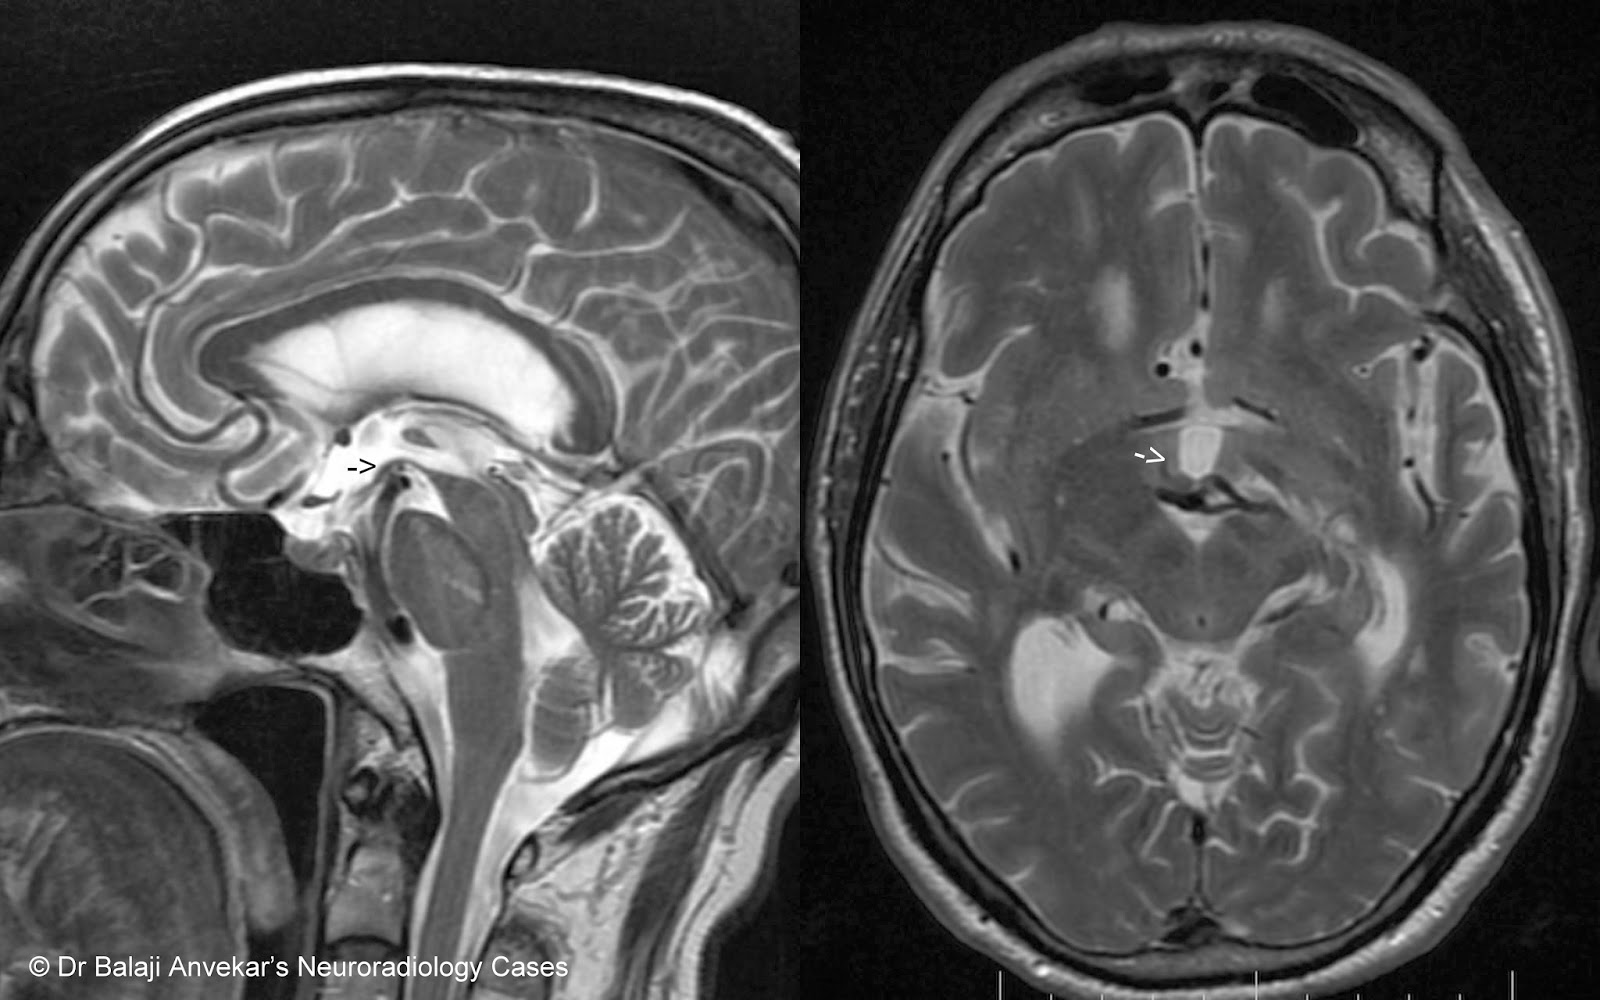 Dr Balaji Anvekar's Neuroradiology Cases: 01/03/14 - 01/04/14